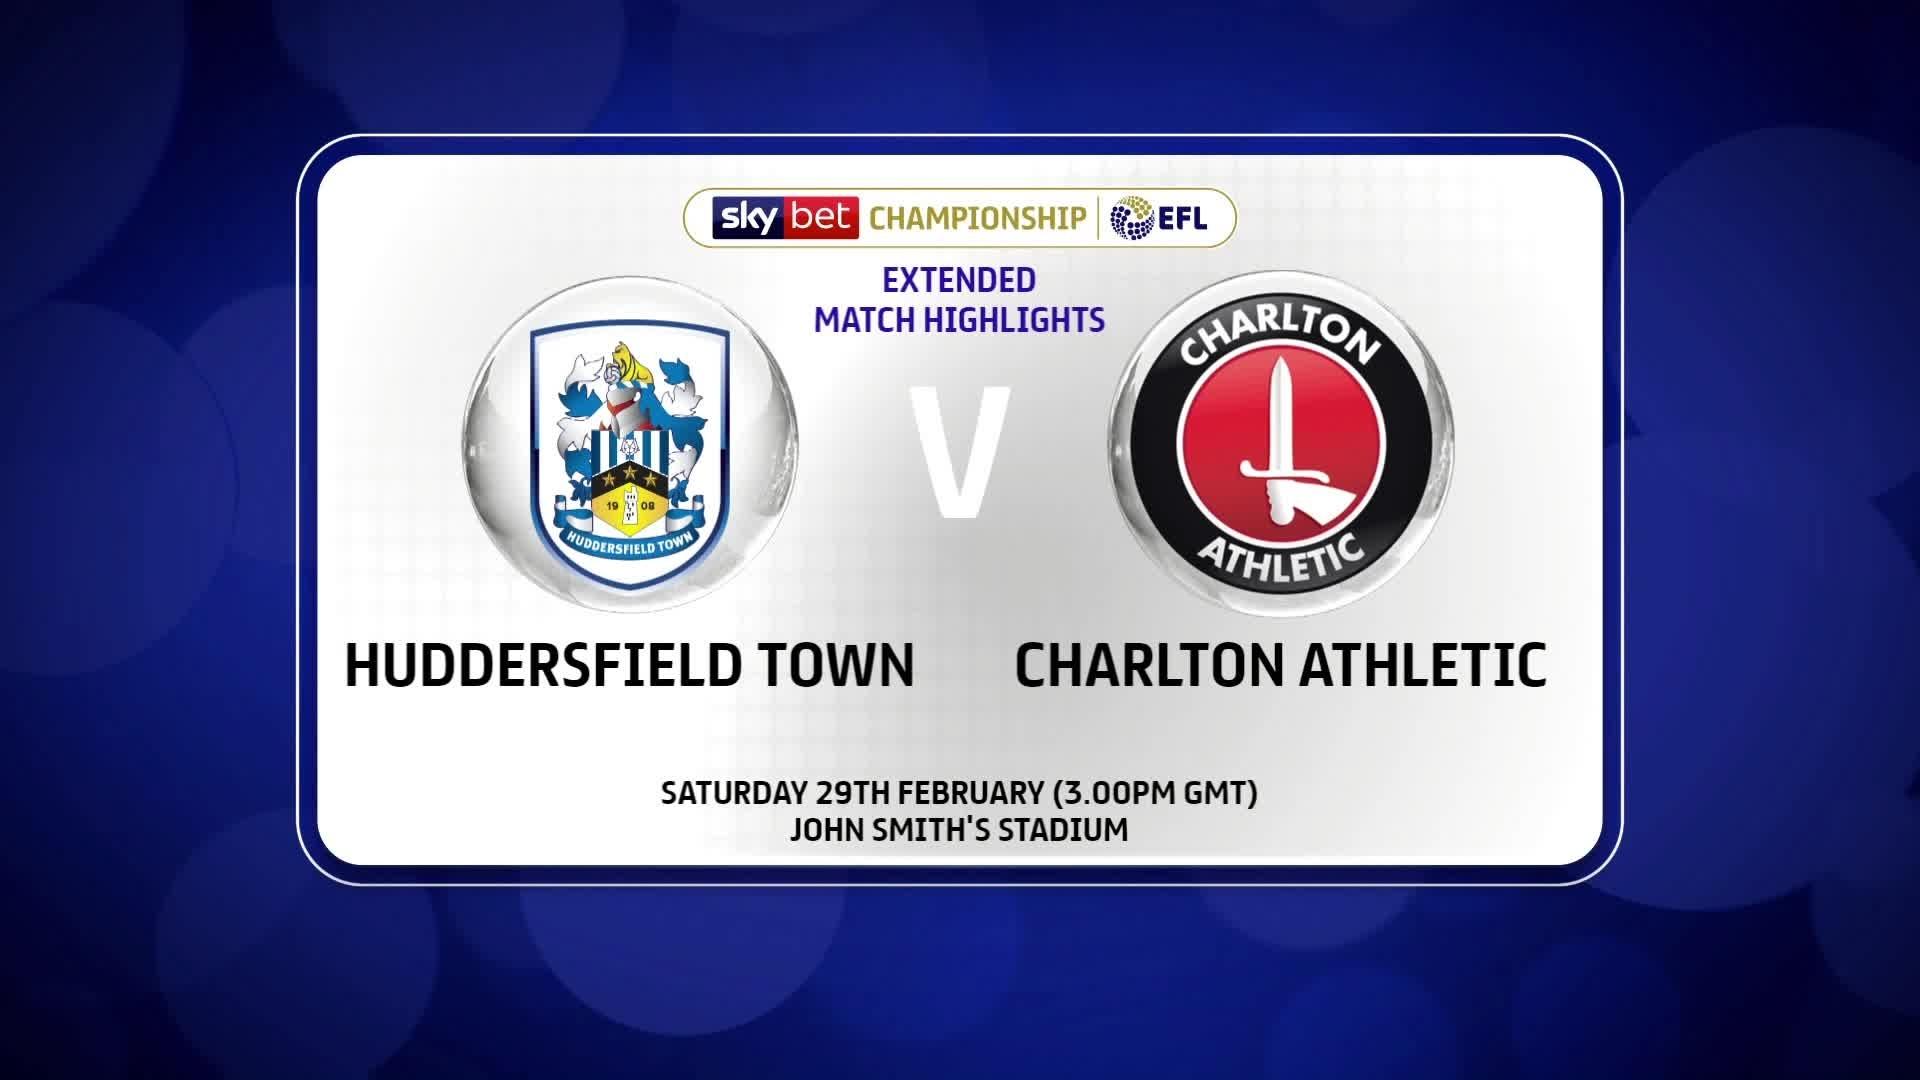 EXTENDED | Huddersfield 4 Charlton 0 (February 2020)